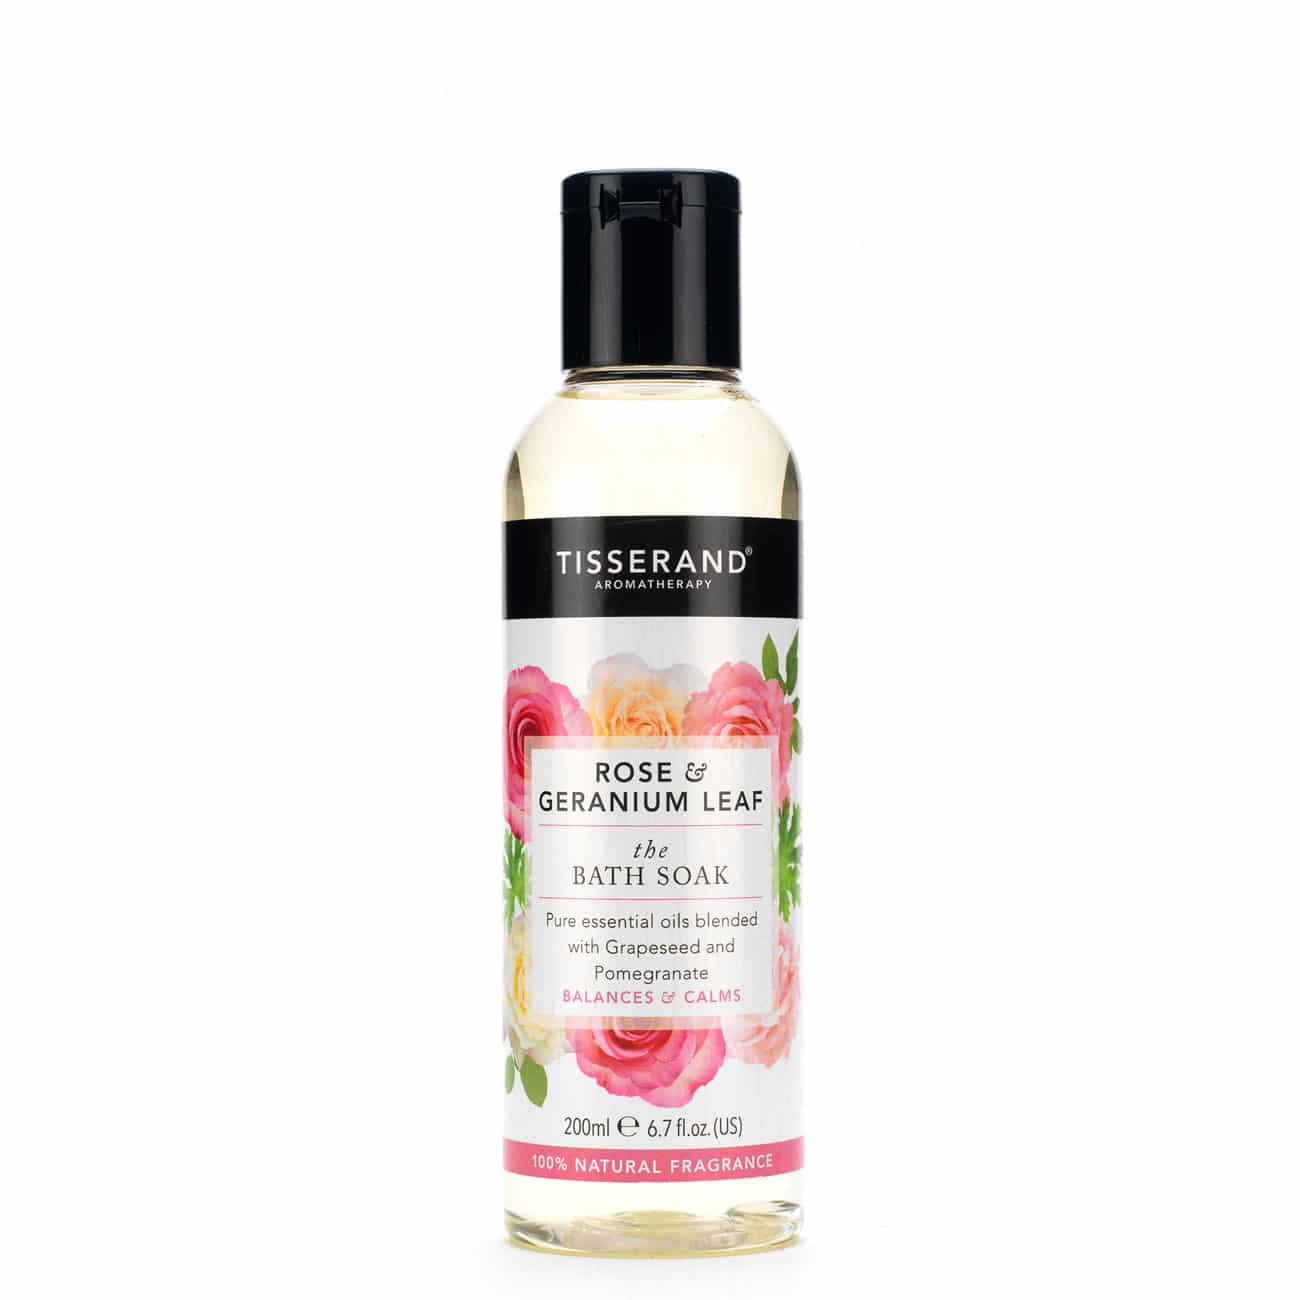 Tisserand-Aromatherapy-Rose-and-Geranium-Leaf-Bath-Soak